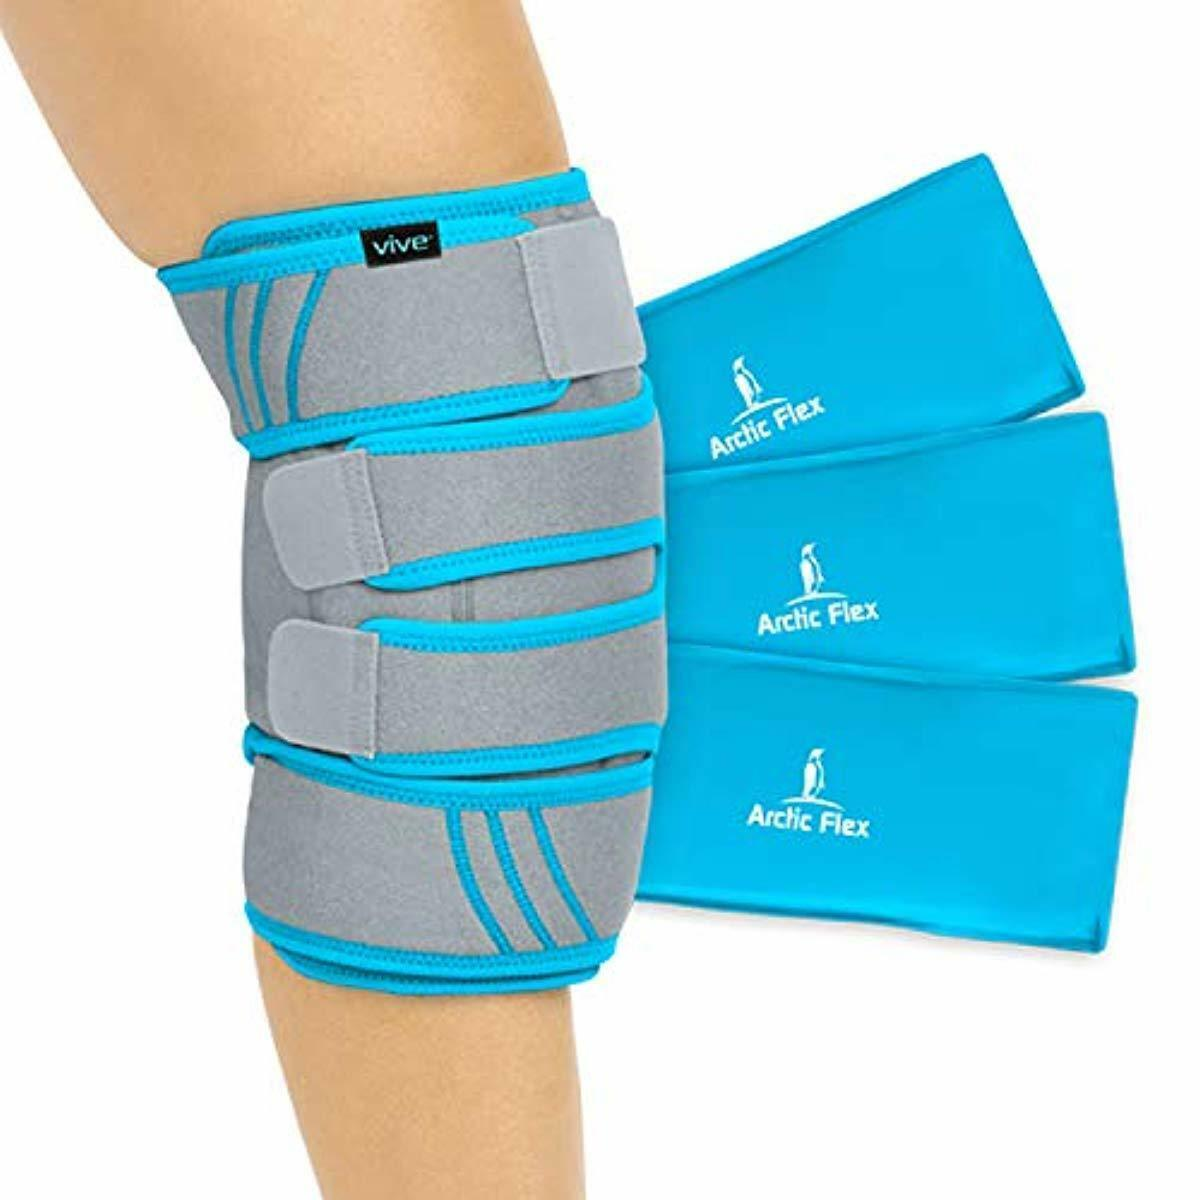 Vive Knee Ice Pack Wrap - Cold/Hot Gel Compression Brace - H